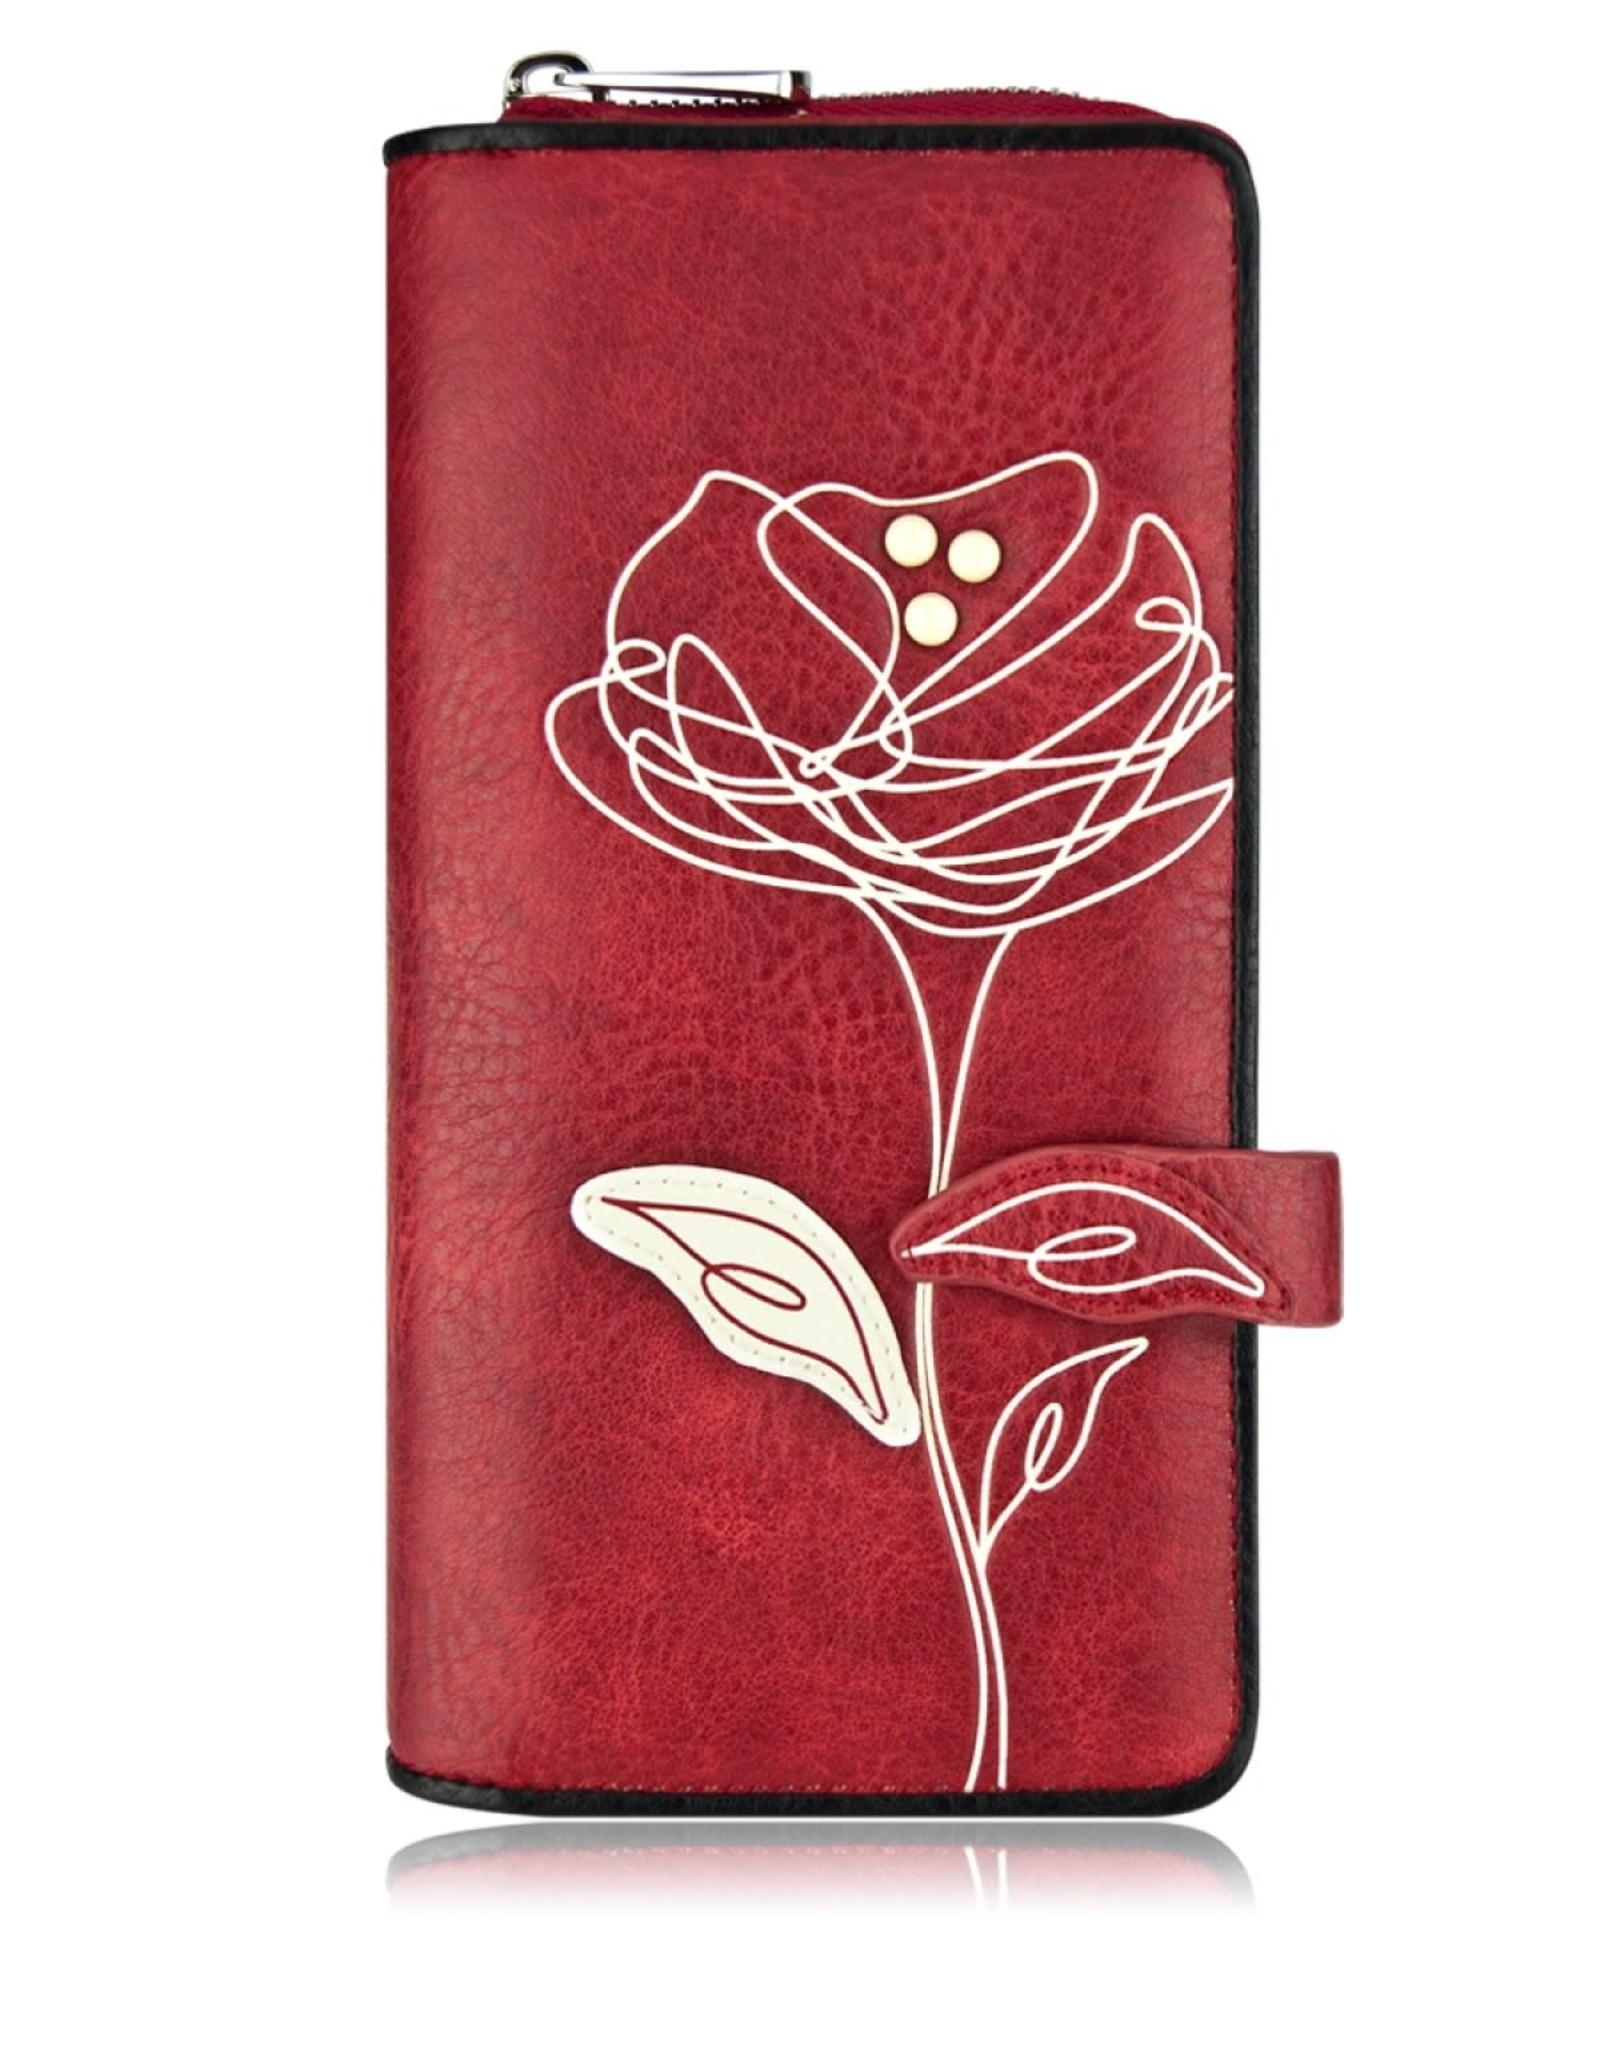 ESPE Portefeuille clutch Rosie Rouge